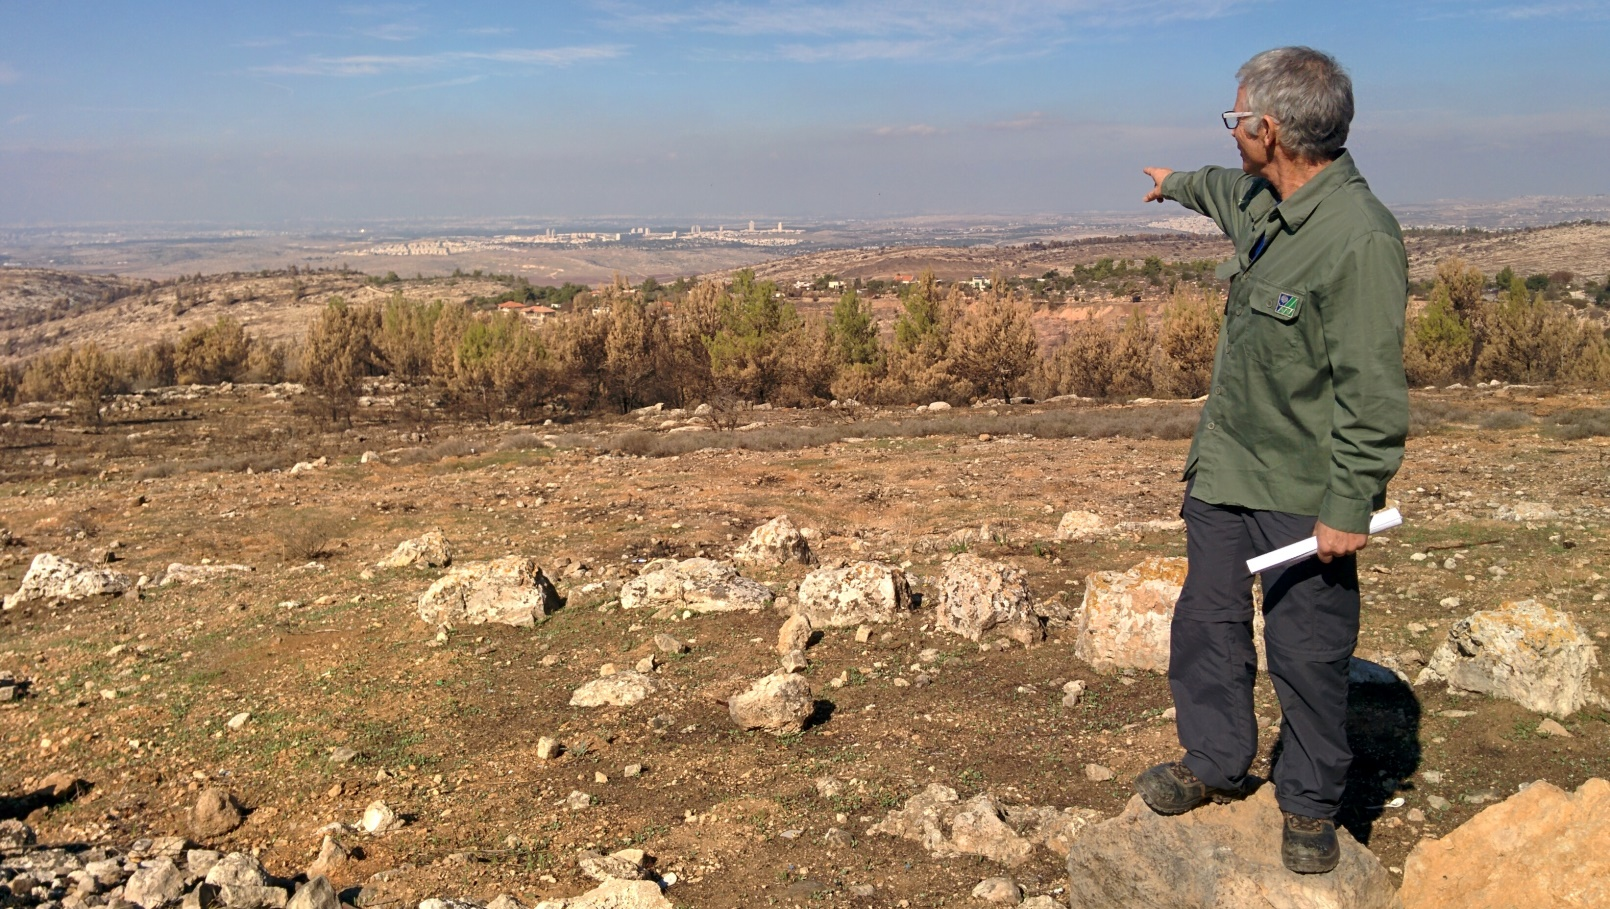 KKL-JNF forest supervisor Chanoch Zoref pointing from Har HaRuach toward Modi'in. Photo by Abigail Klein Leichman